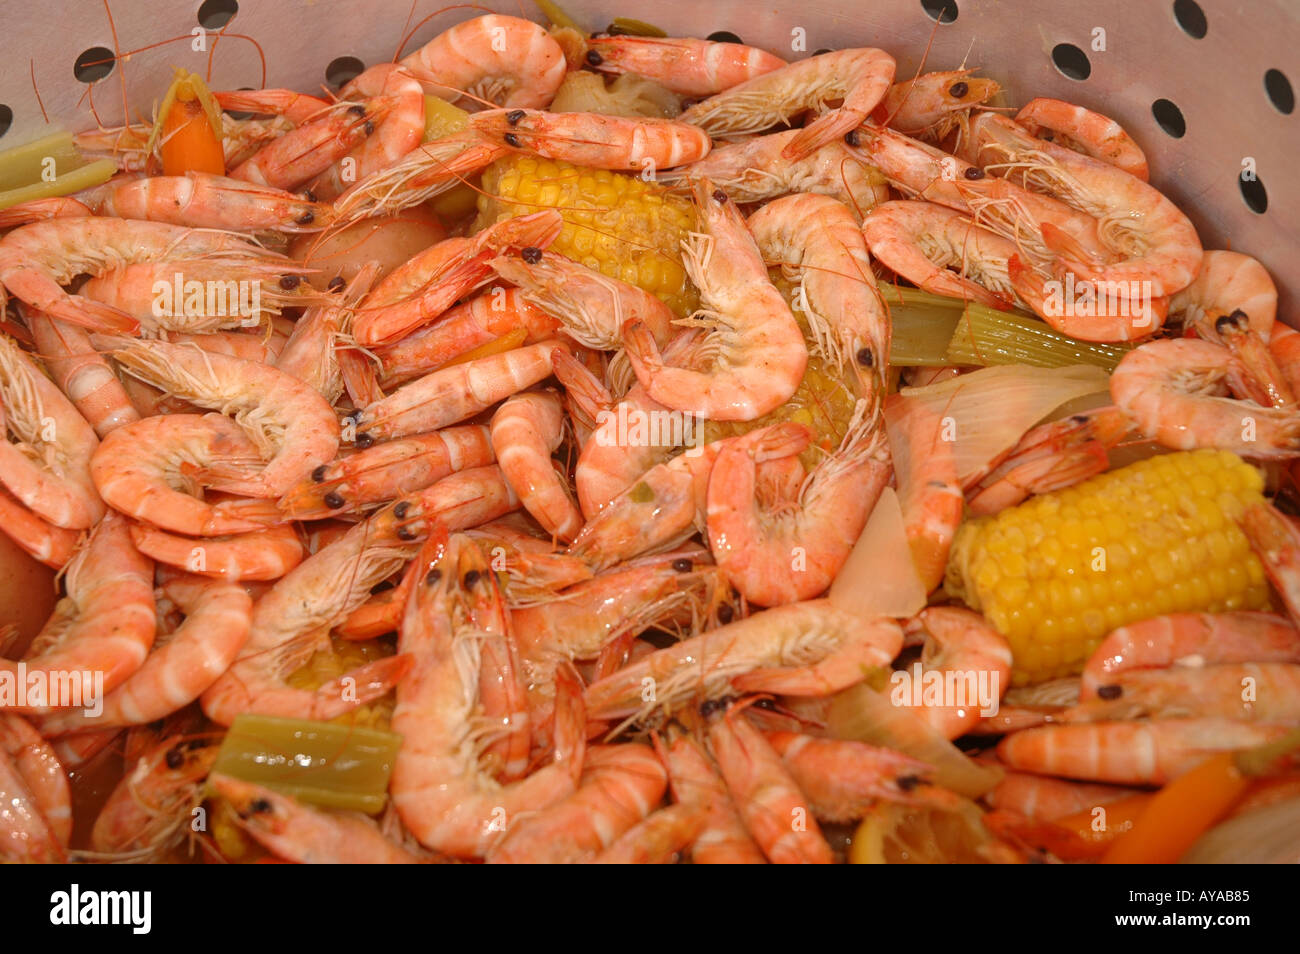 Louisiana shrimp boil Cajun cooking local foods cuisine - Stock Image